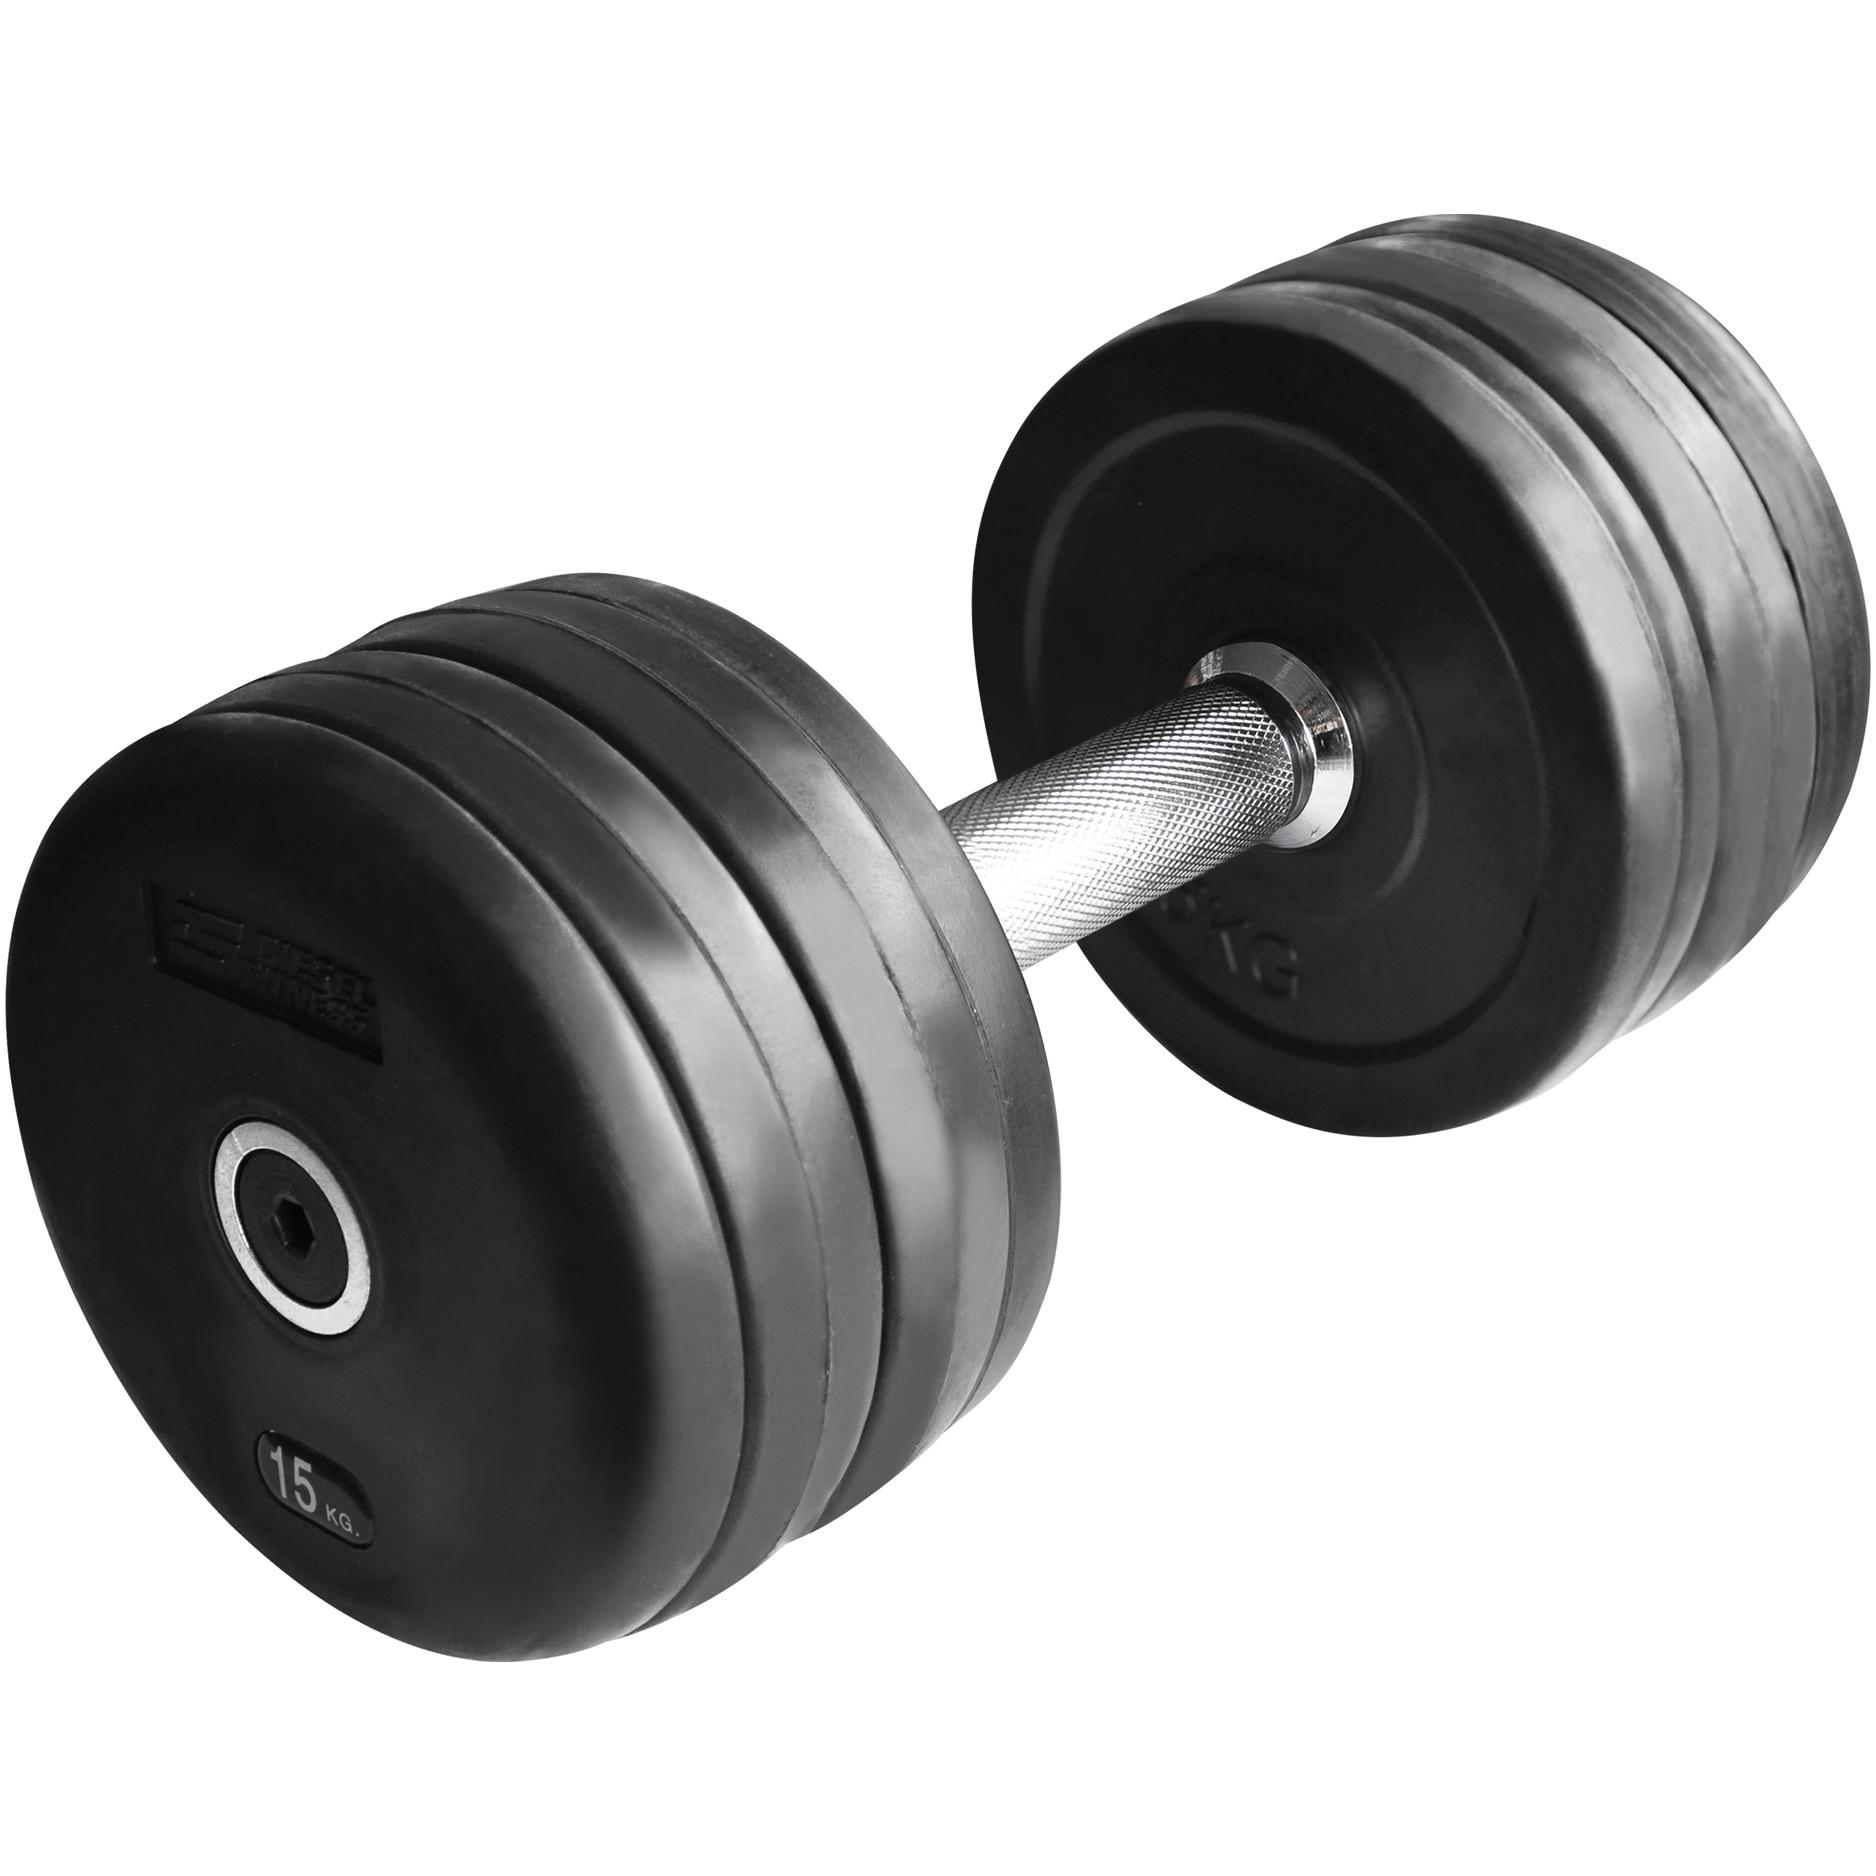 Fotografie Gantera fitness Kondition, coating cauciuc, 15 kg, Negru